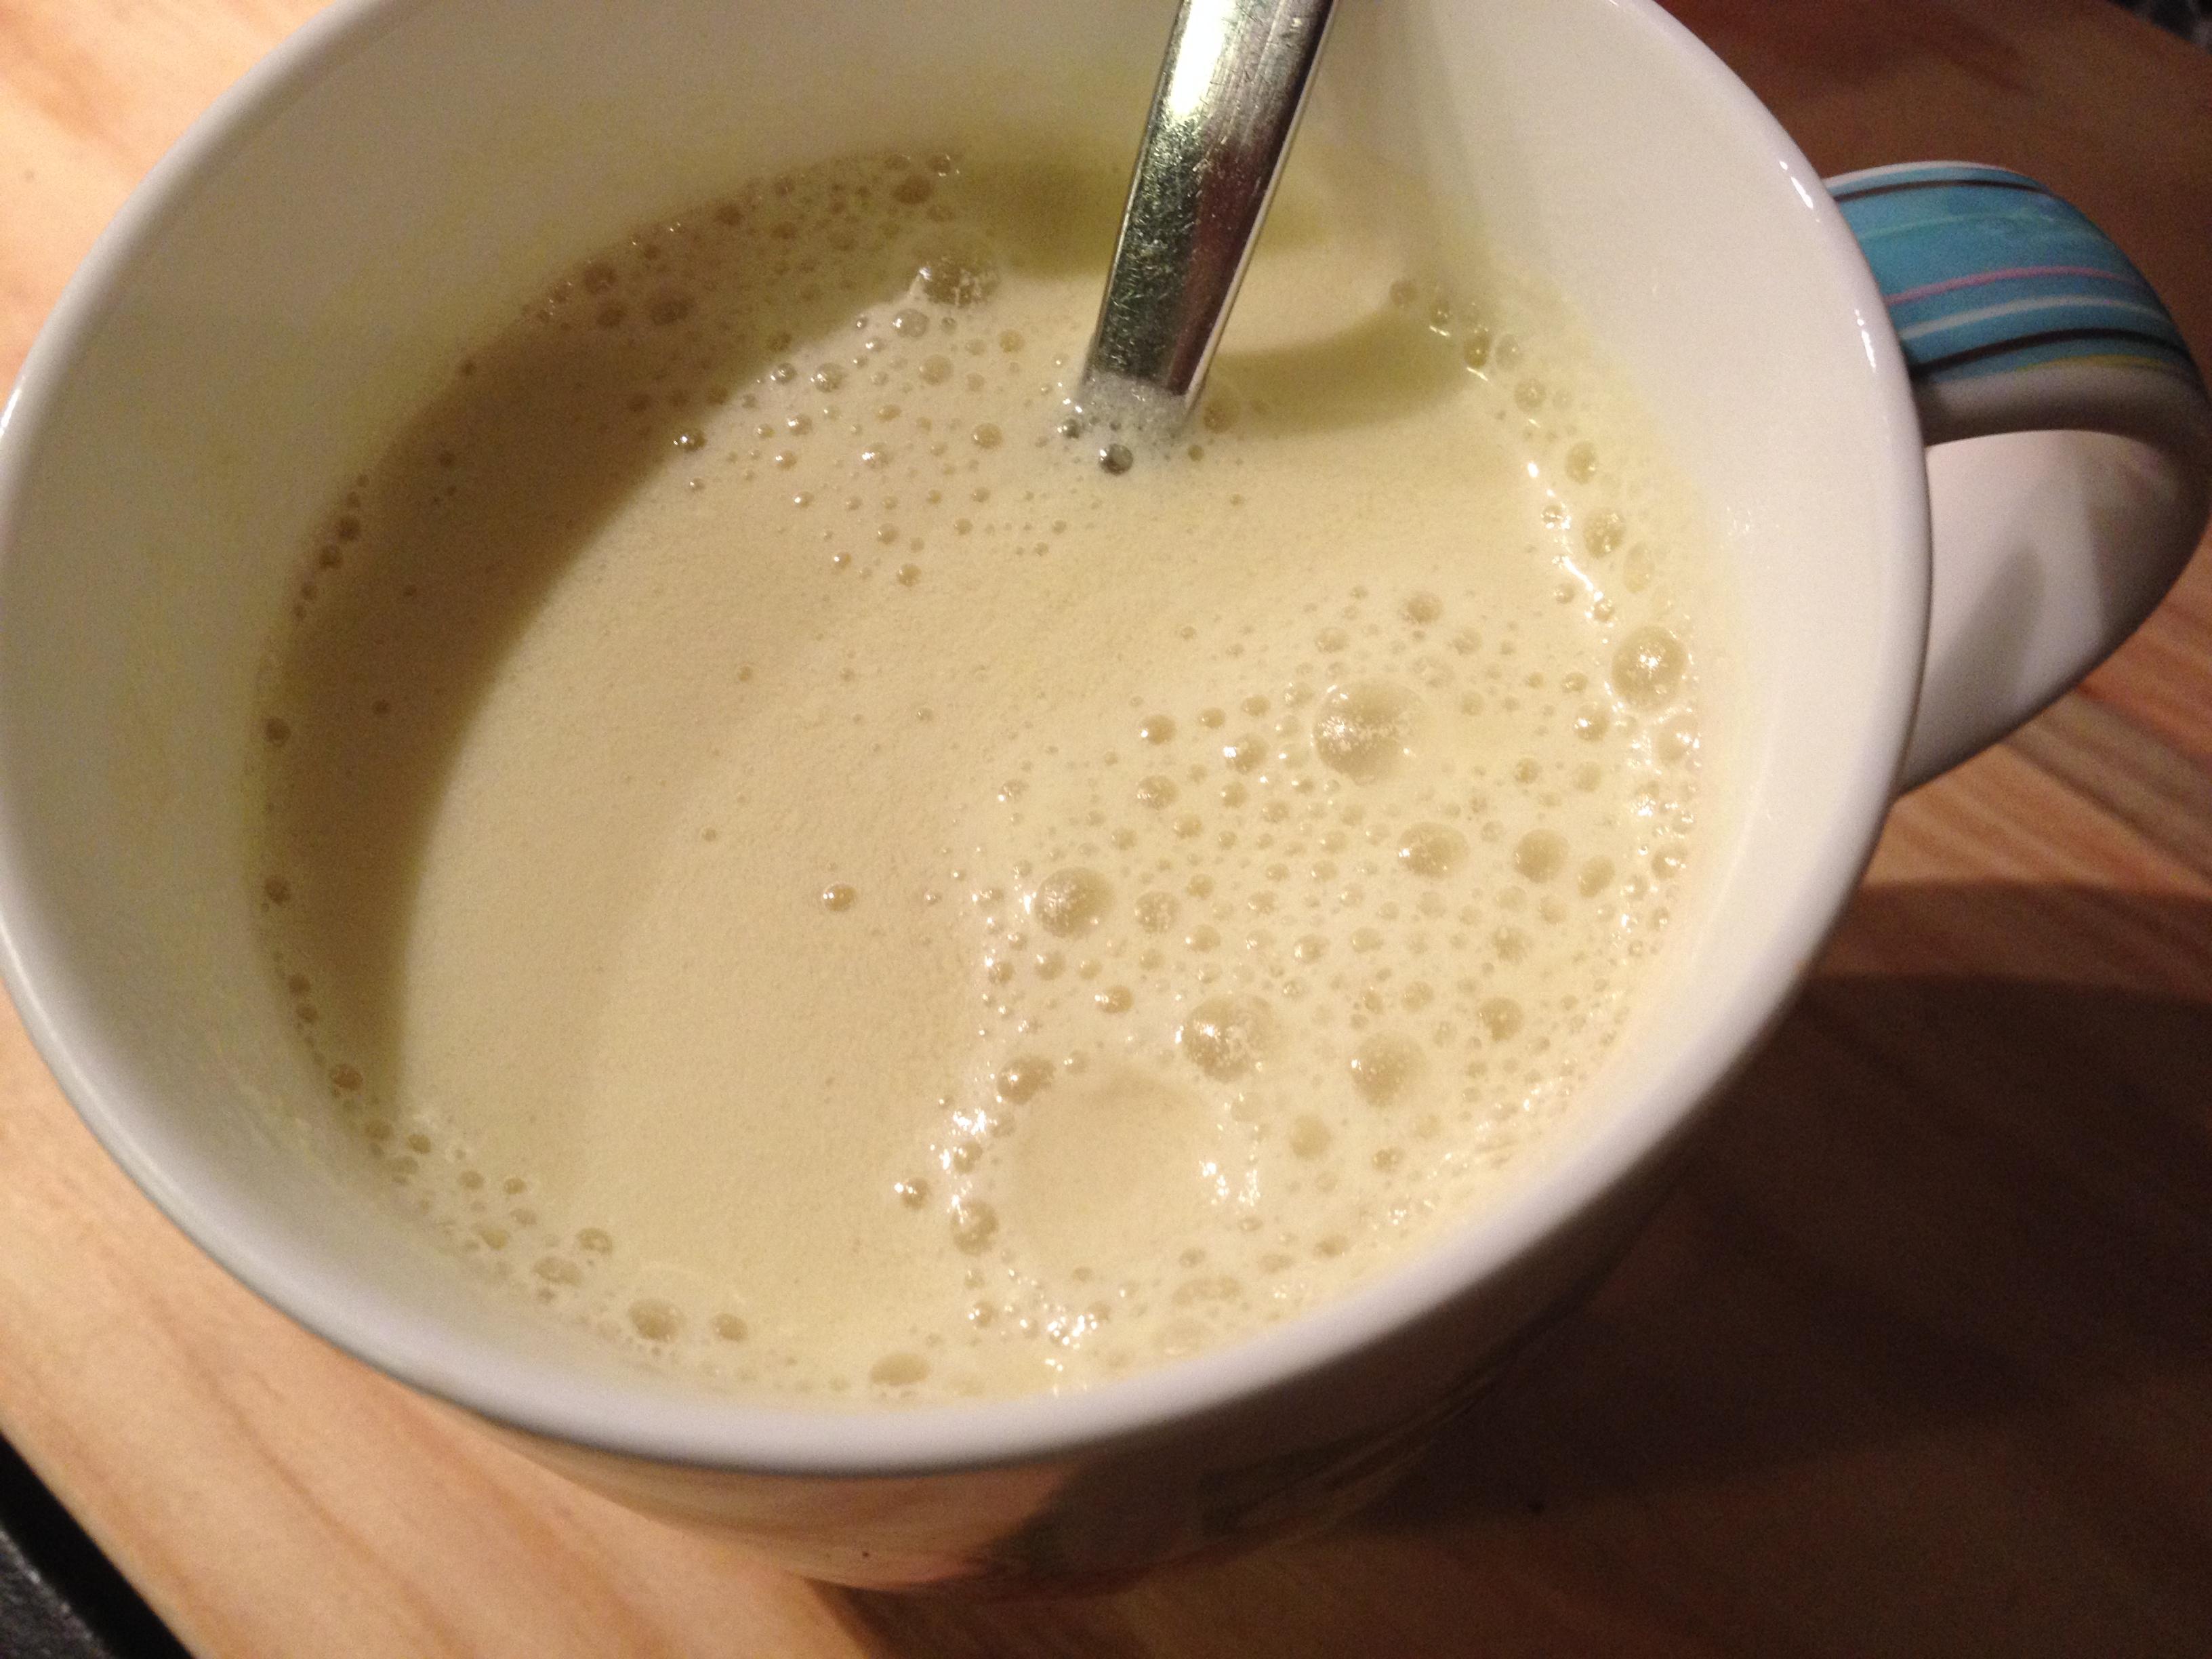 melk met kurkuma